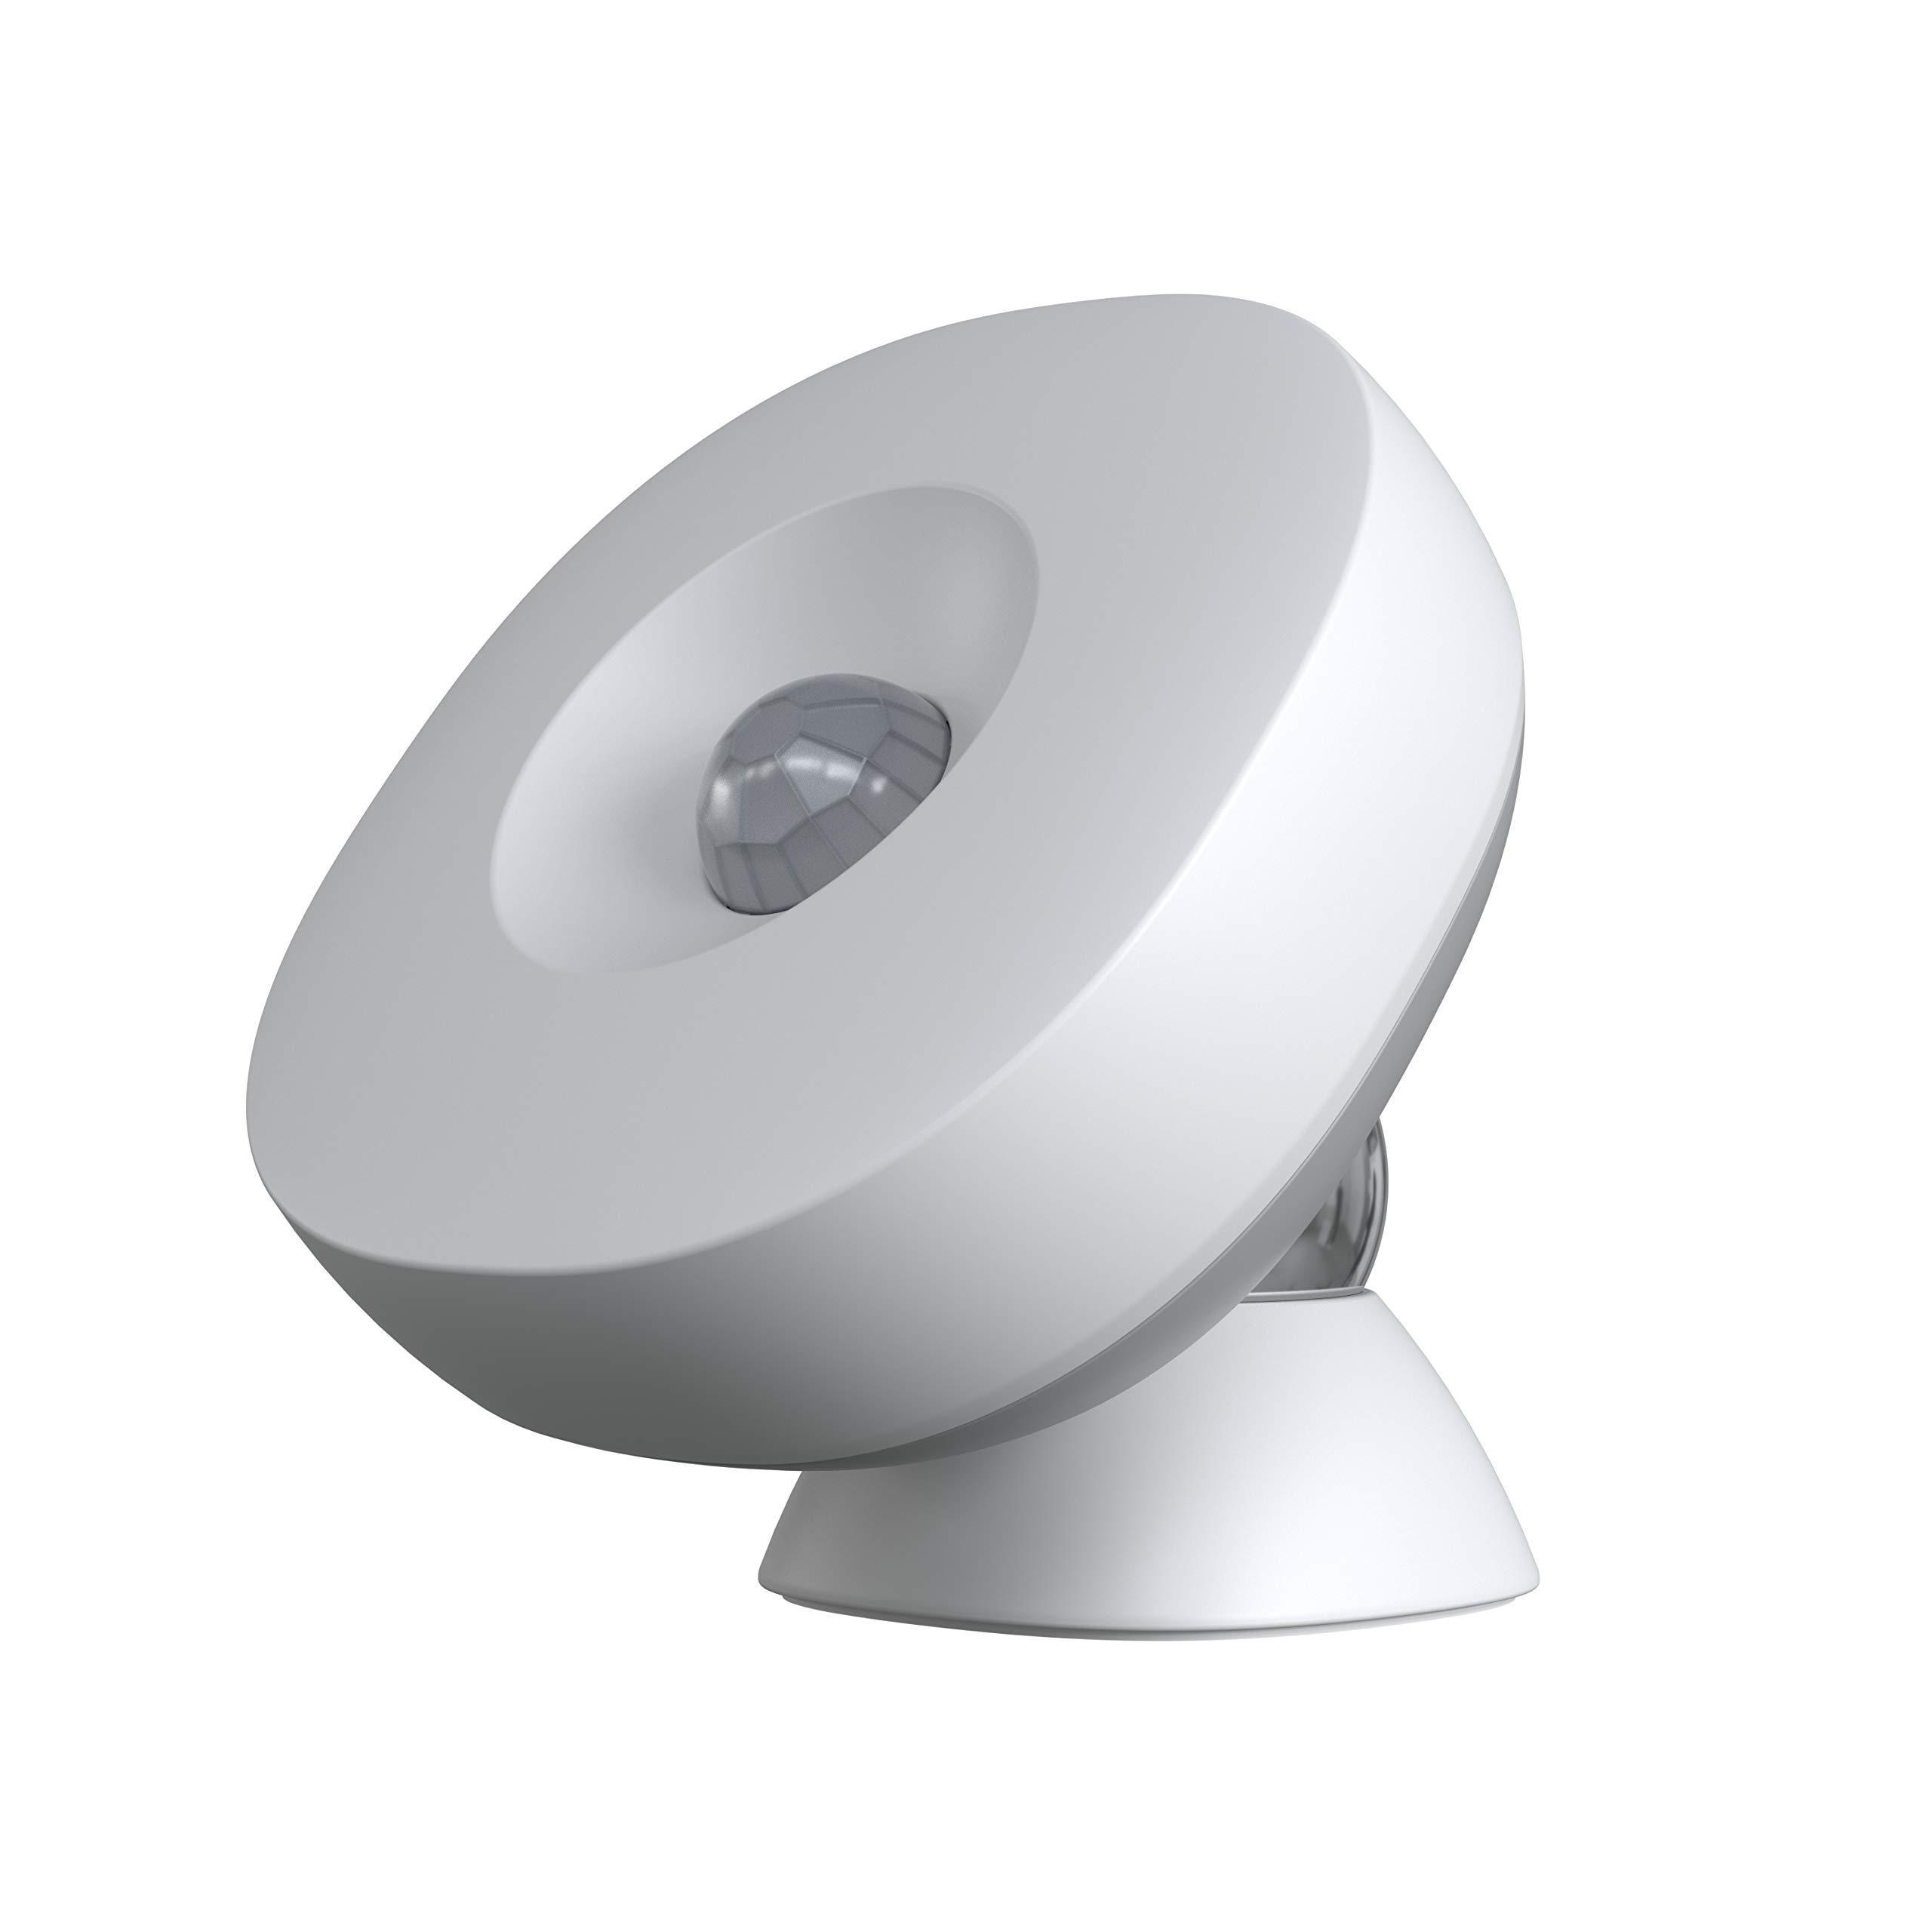 Samsung SmartThings GP-U999SJVLBAA Magnetic Motion Sensor, White